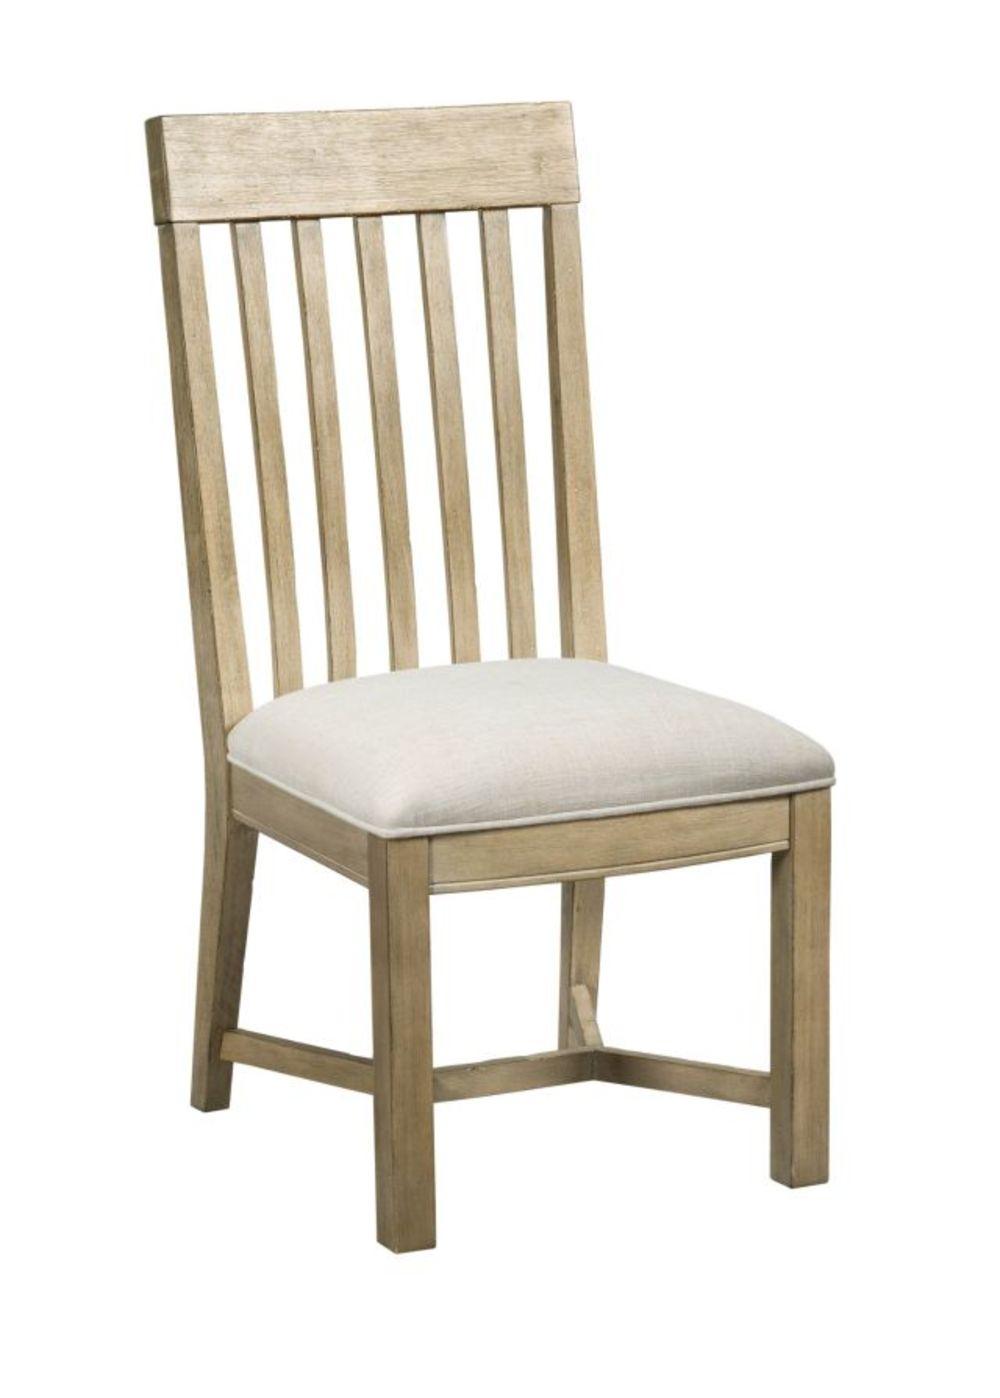 American Drew - James Side Chair